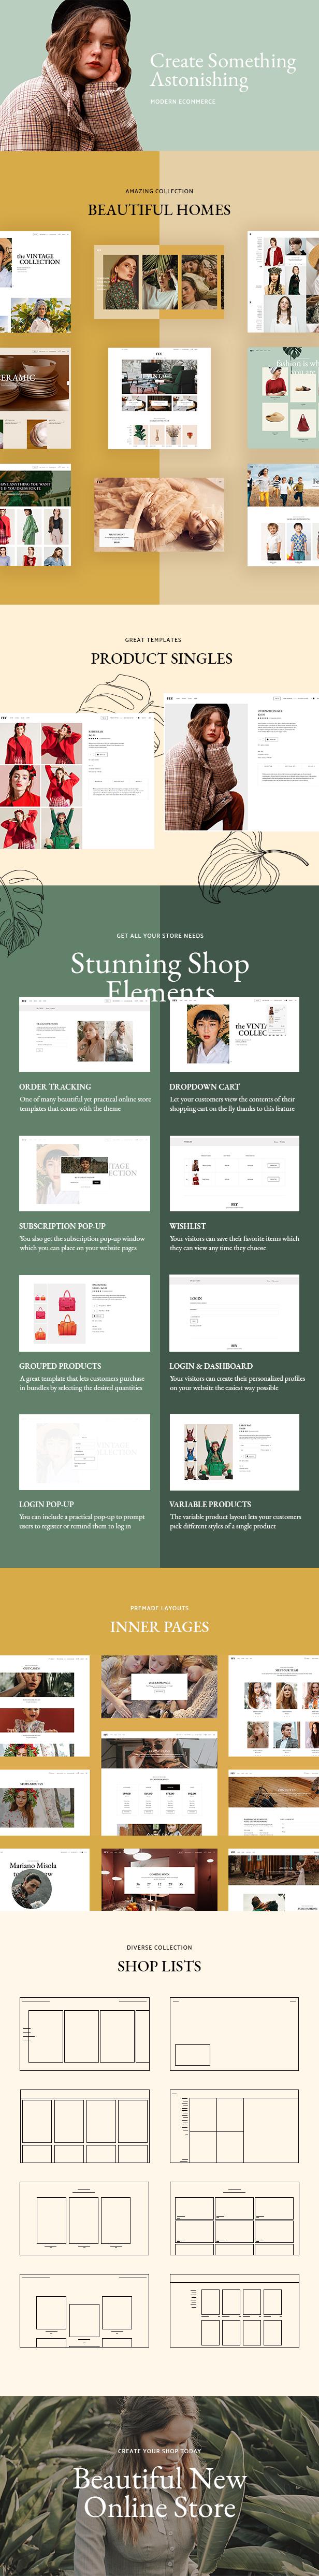 Fey - Modern eCommerce Theme - 2